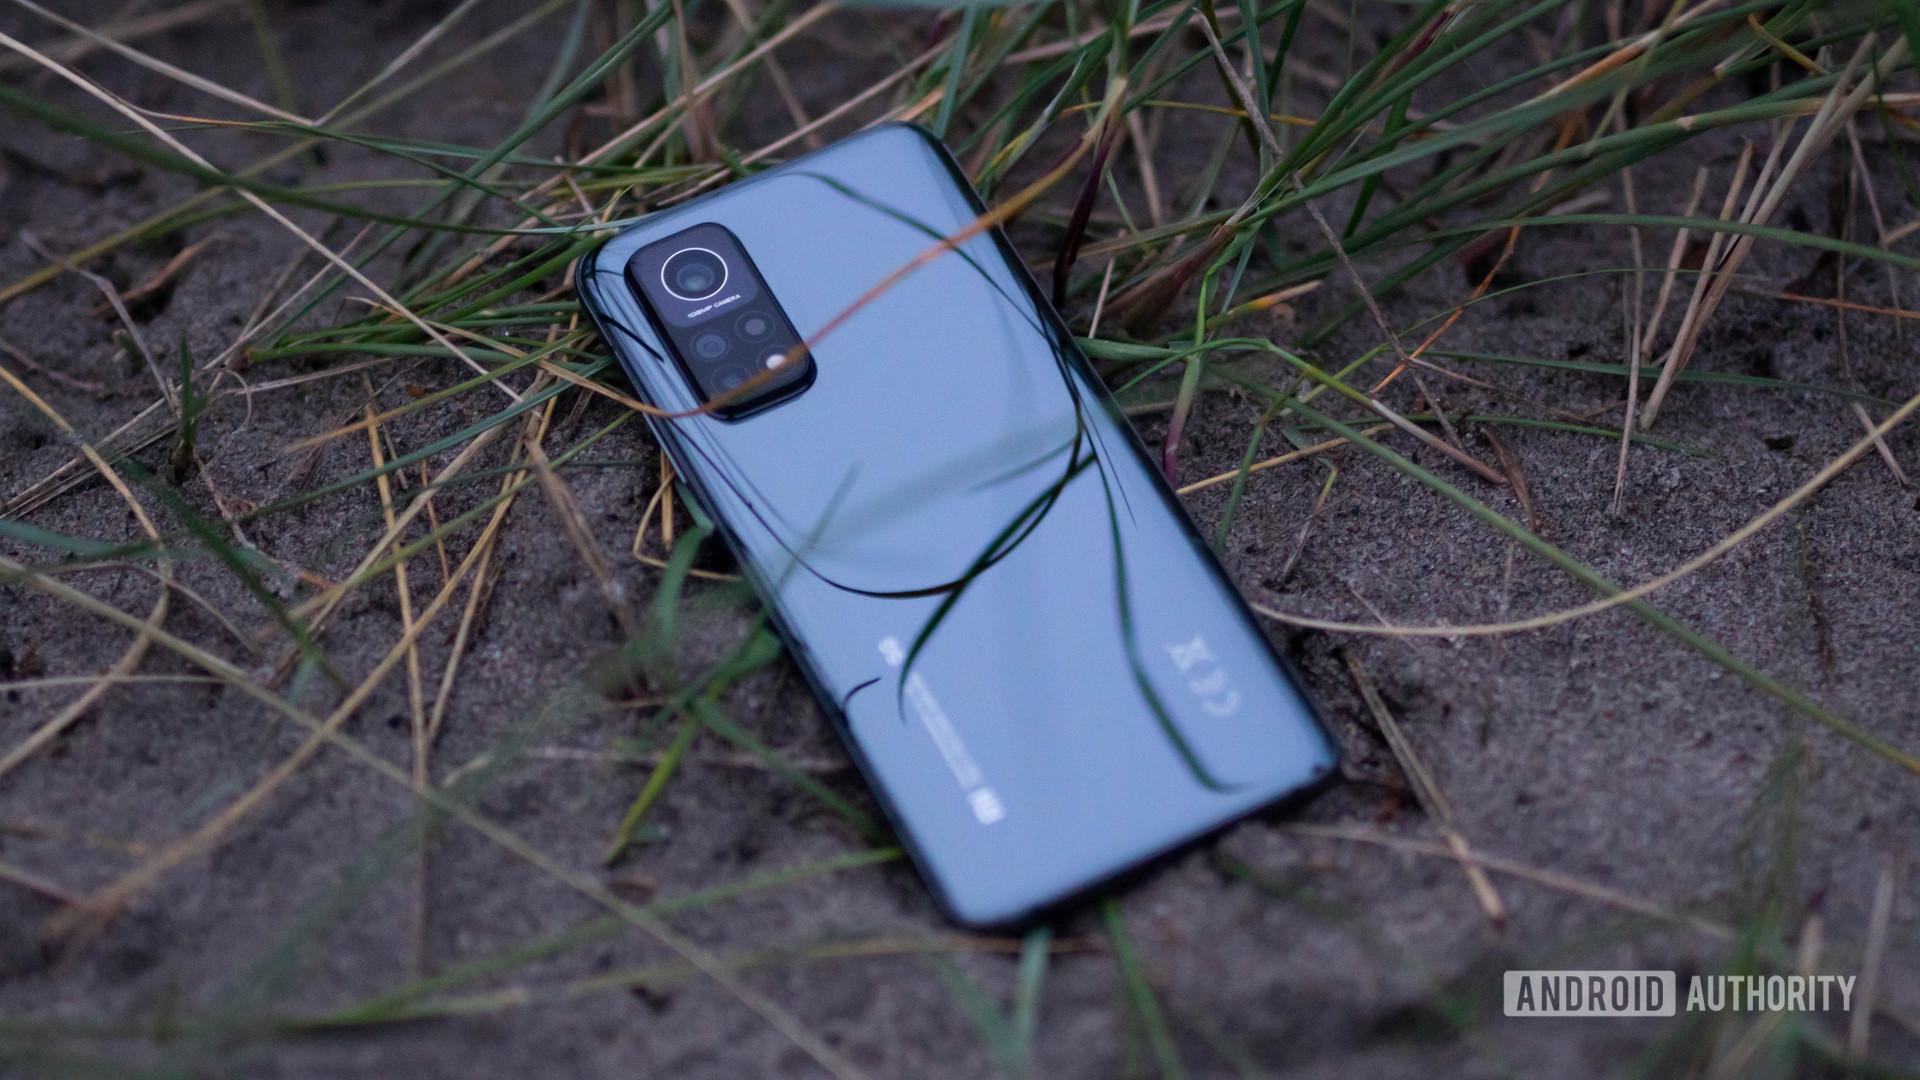 Xiaomi Mi 10T Pro rear view in the sand